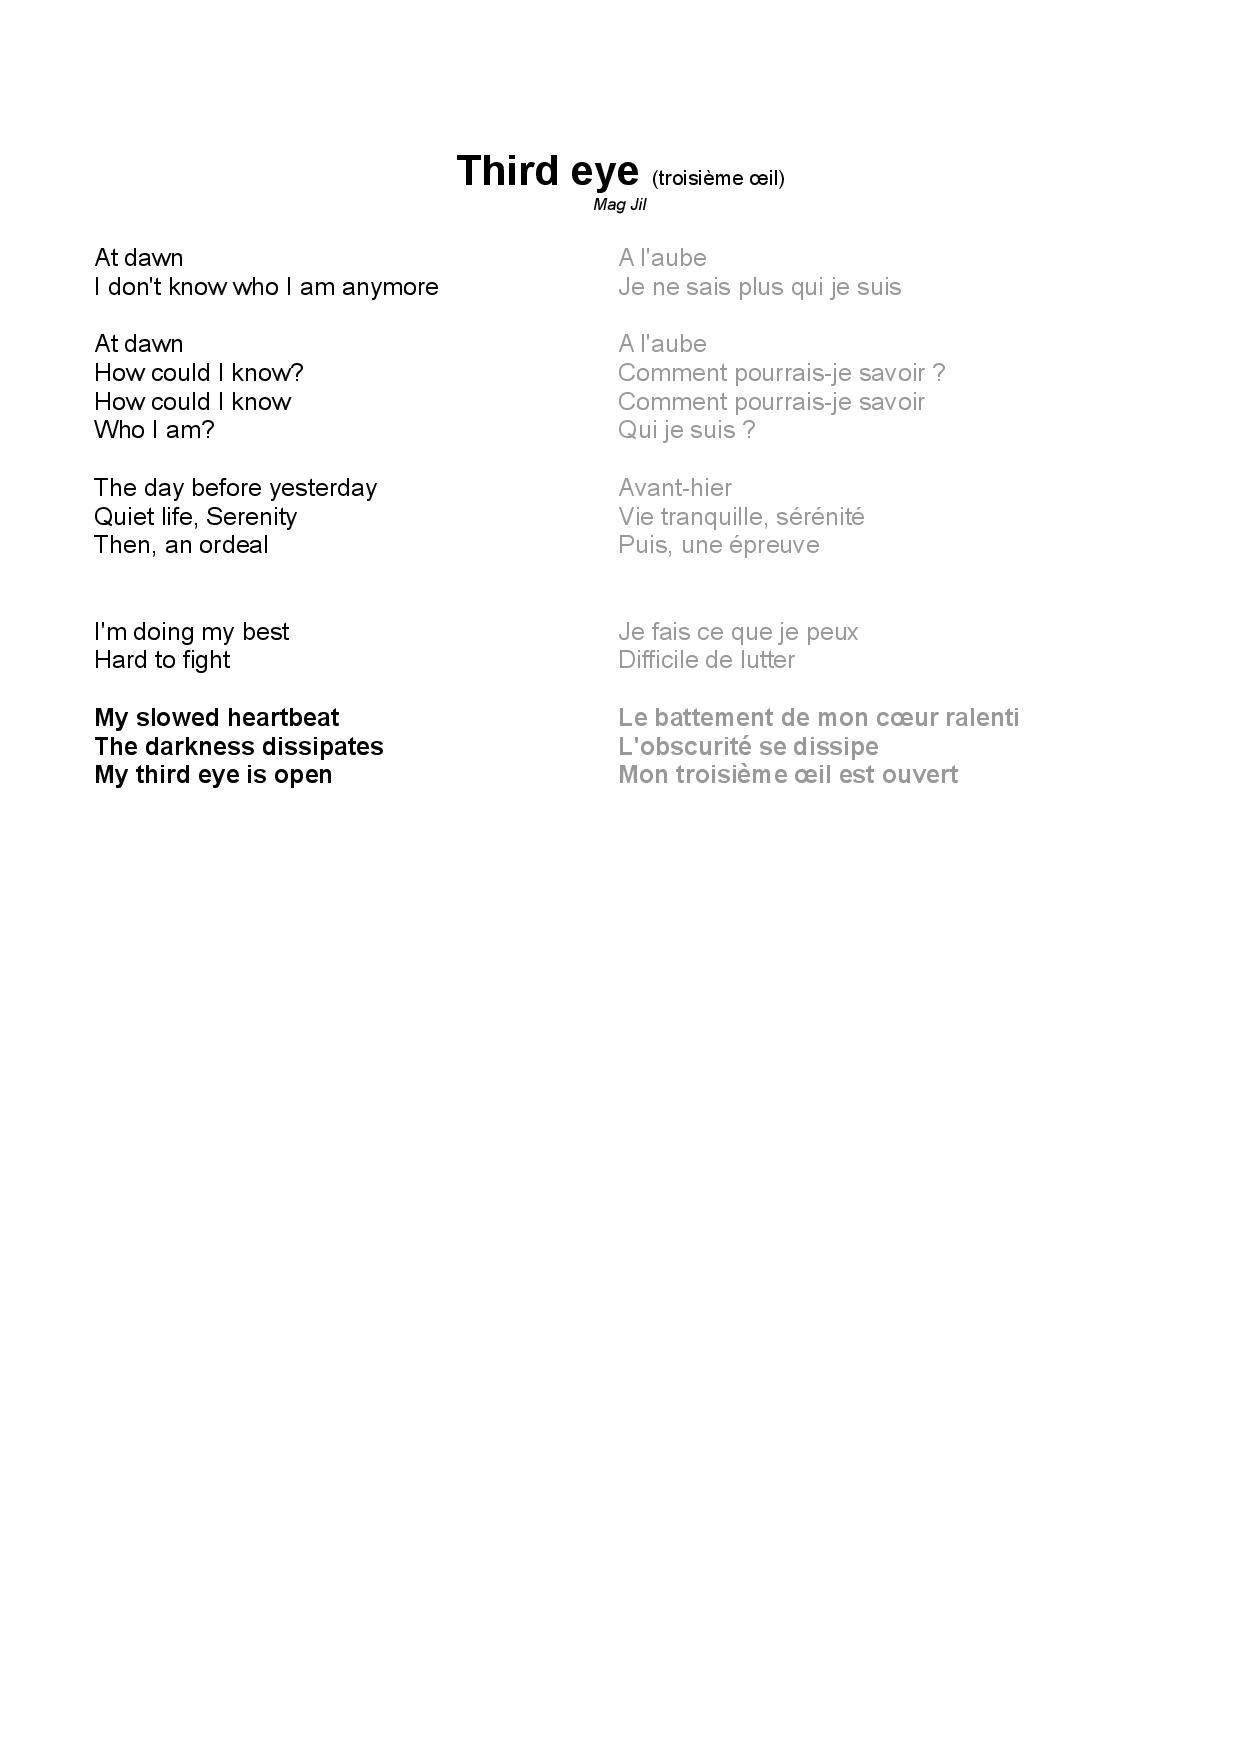 01-third-eye-page-001